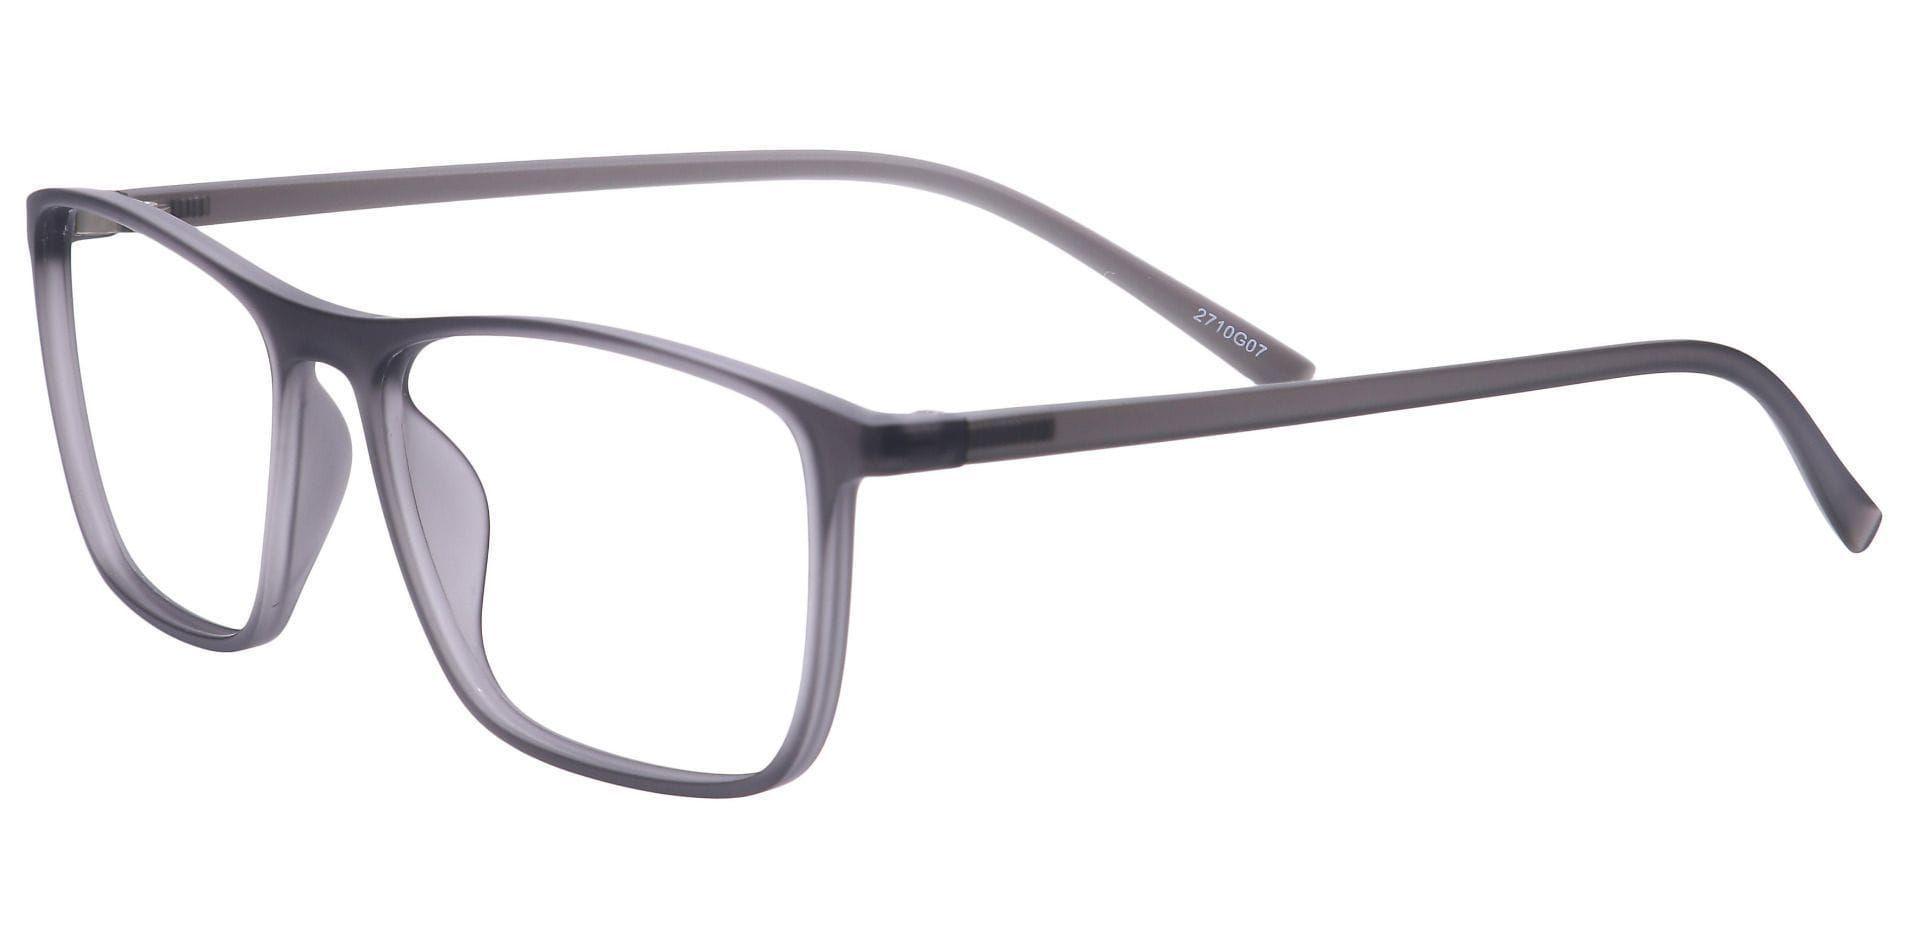 Candid Rectangle Blue Light Blocking Glasses - Gray